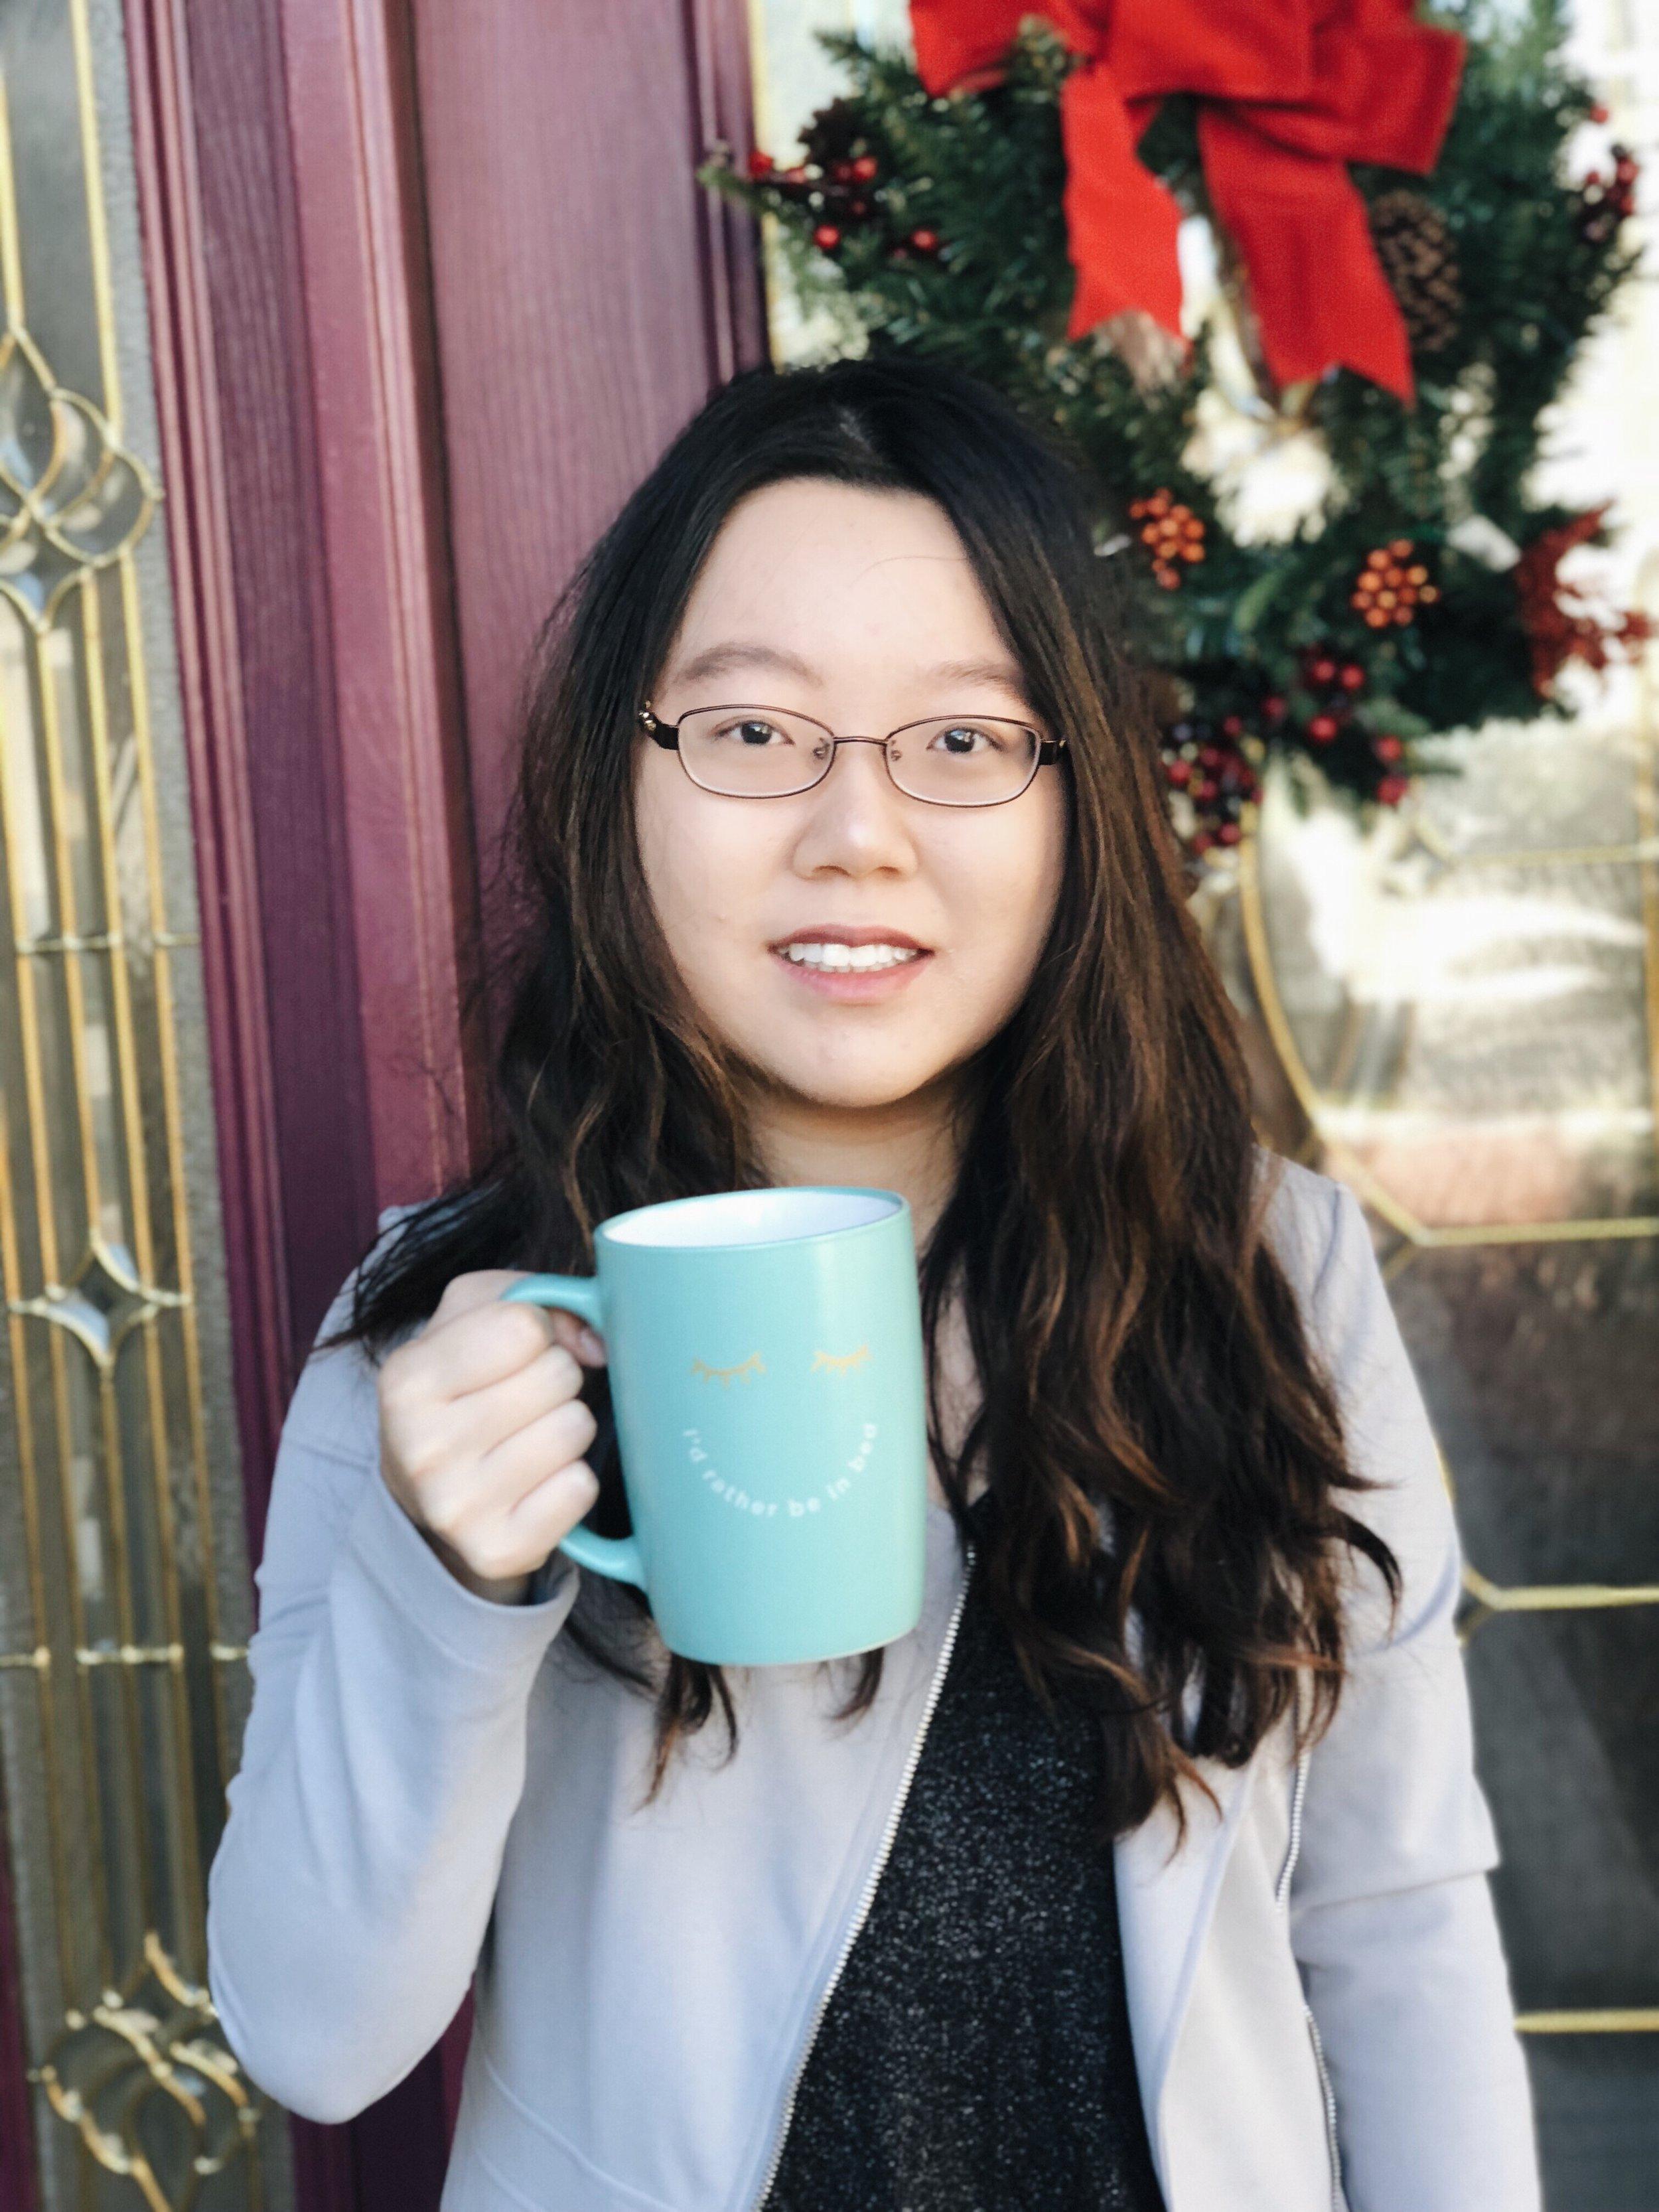 Love my mug from the FabFitFun Winter Box! I recommend subscribing!